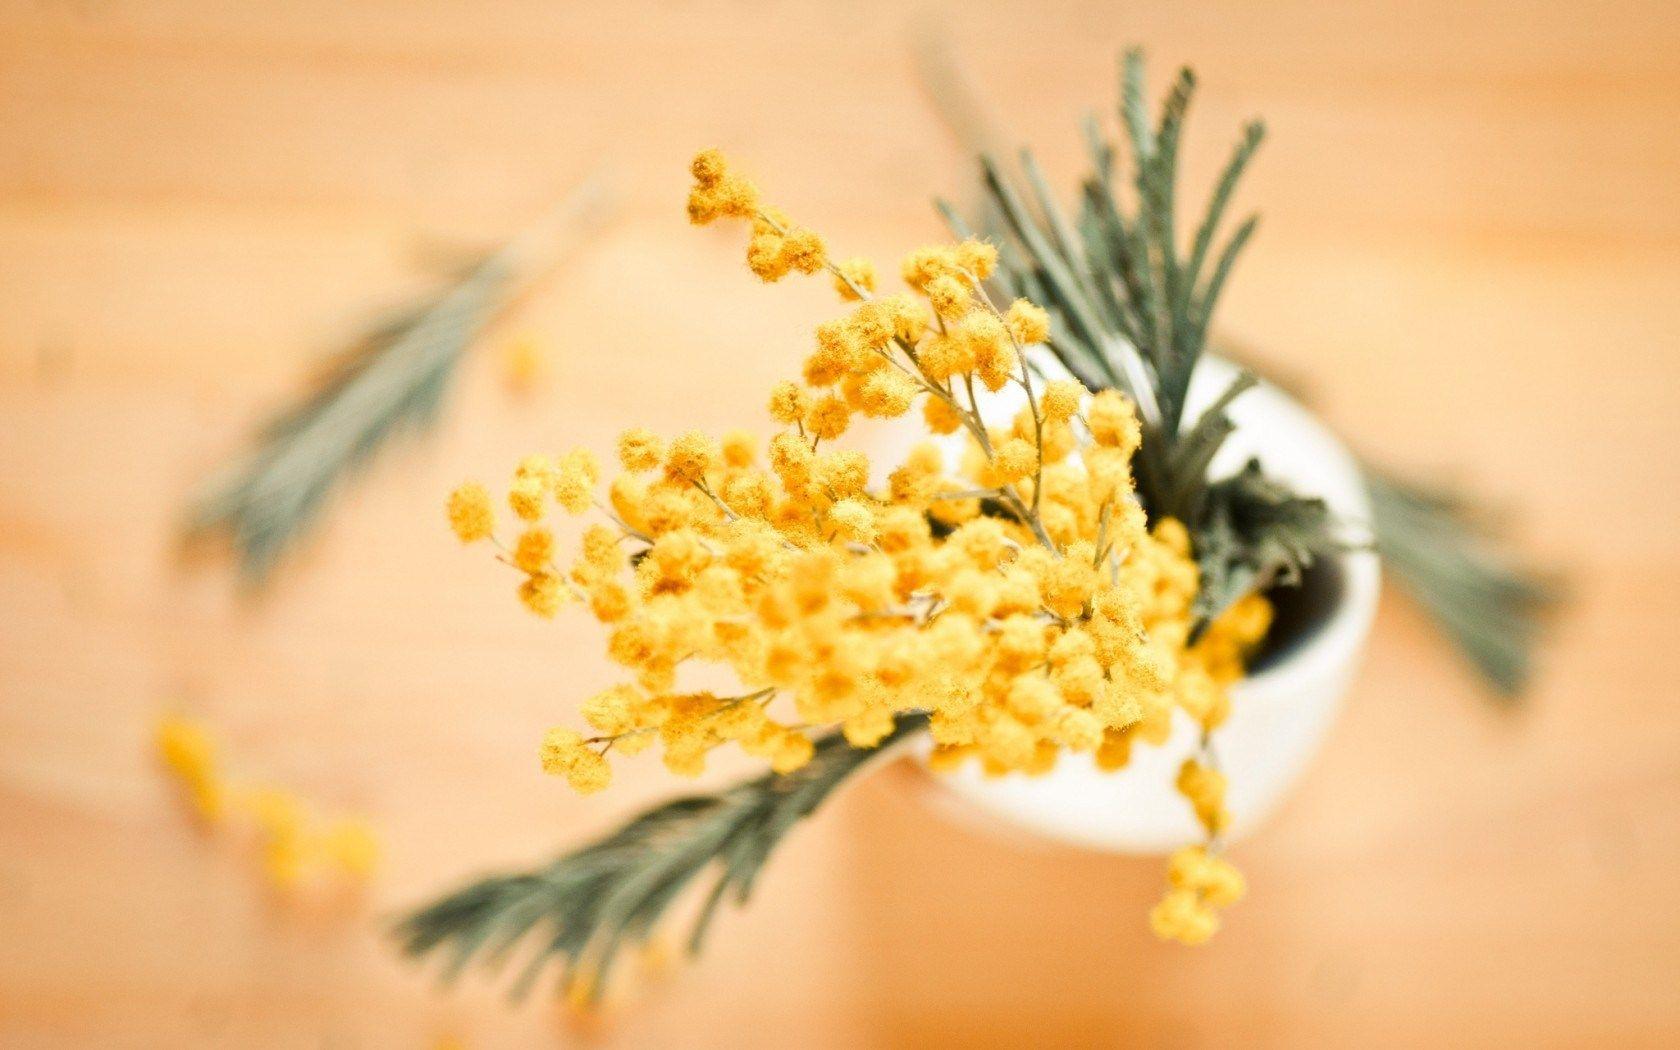 Acacia dealbata mimosa flowers yellow vase sari ekler acacia dealbata mimosa flowers yellow vase mightylinksfo